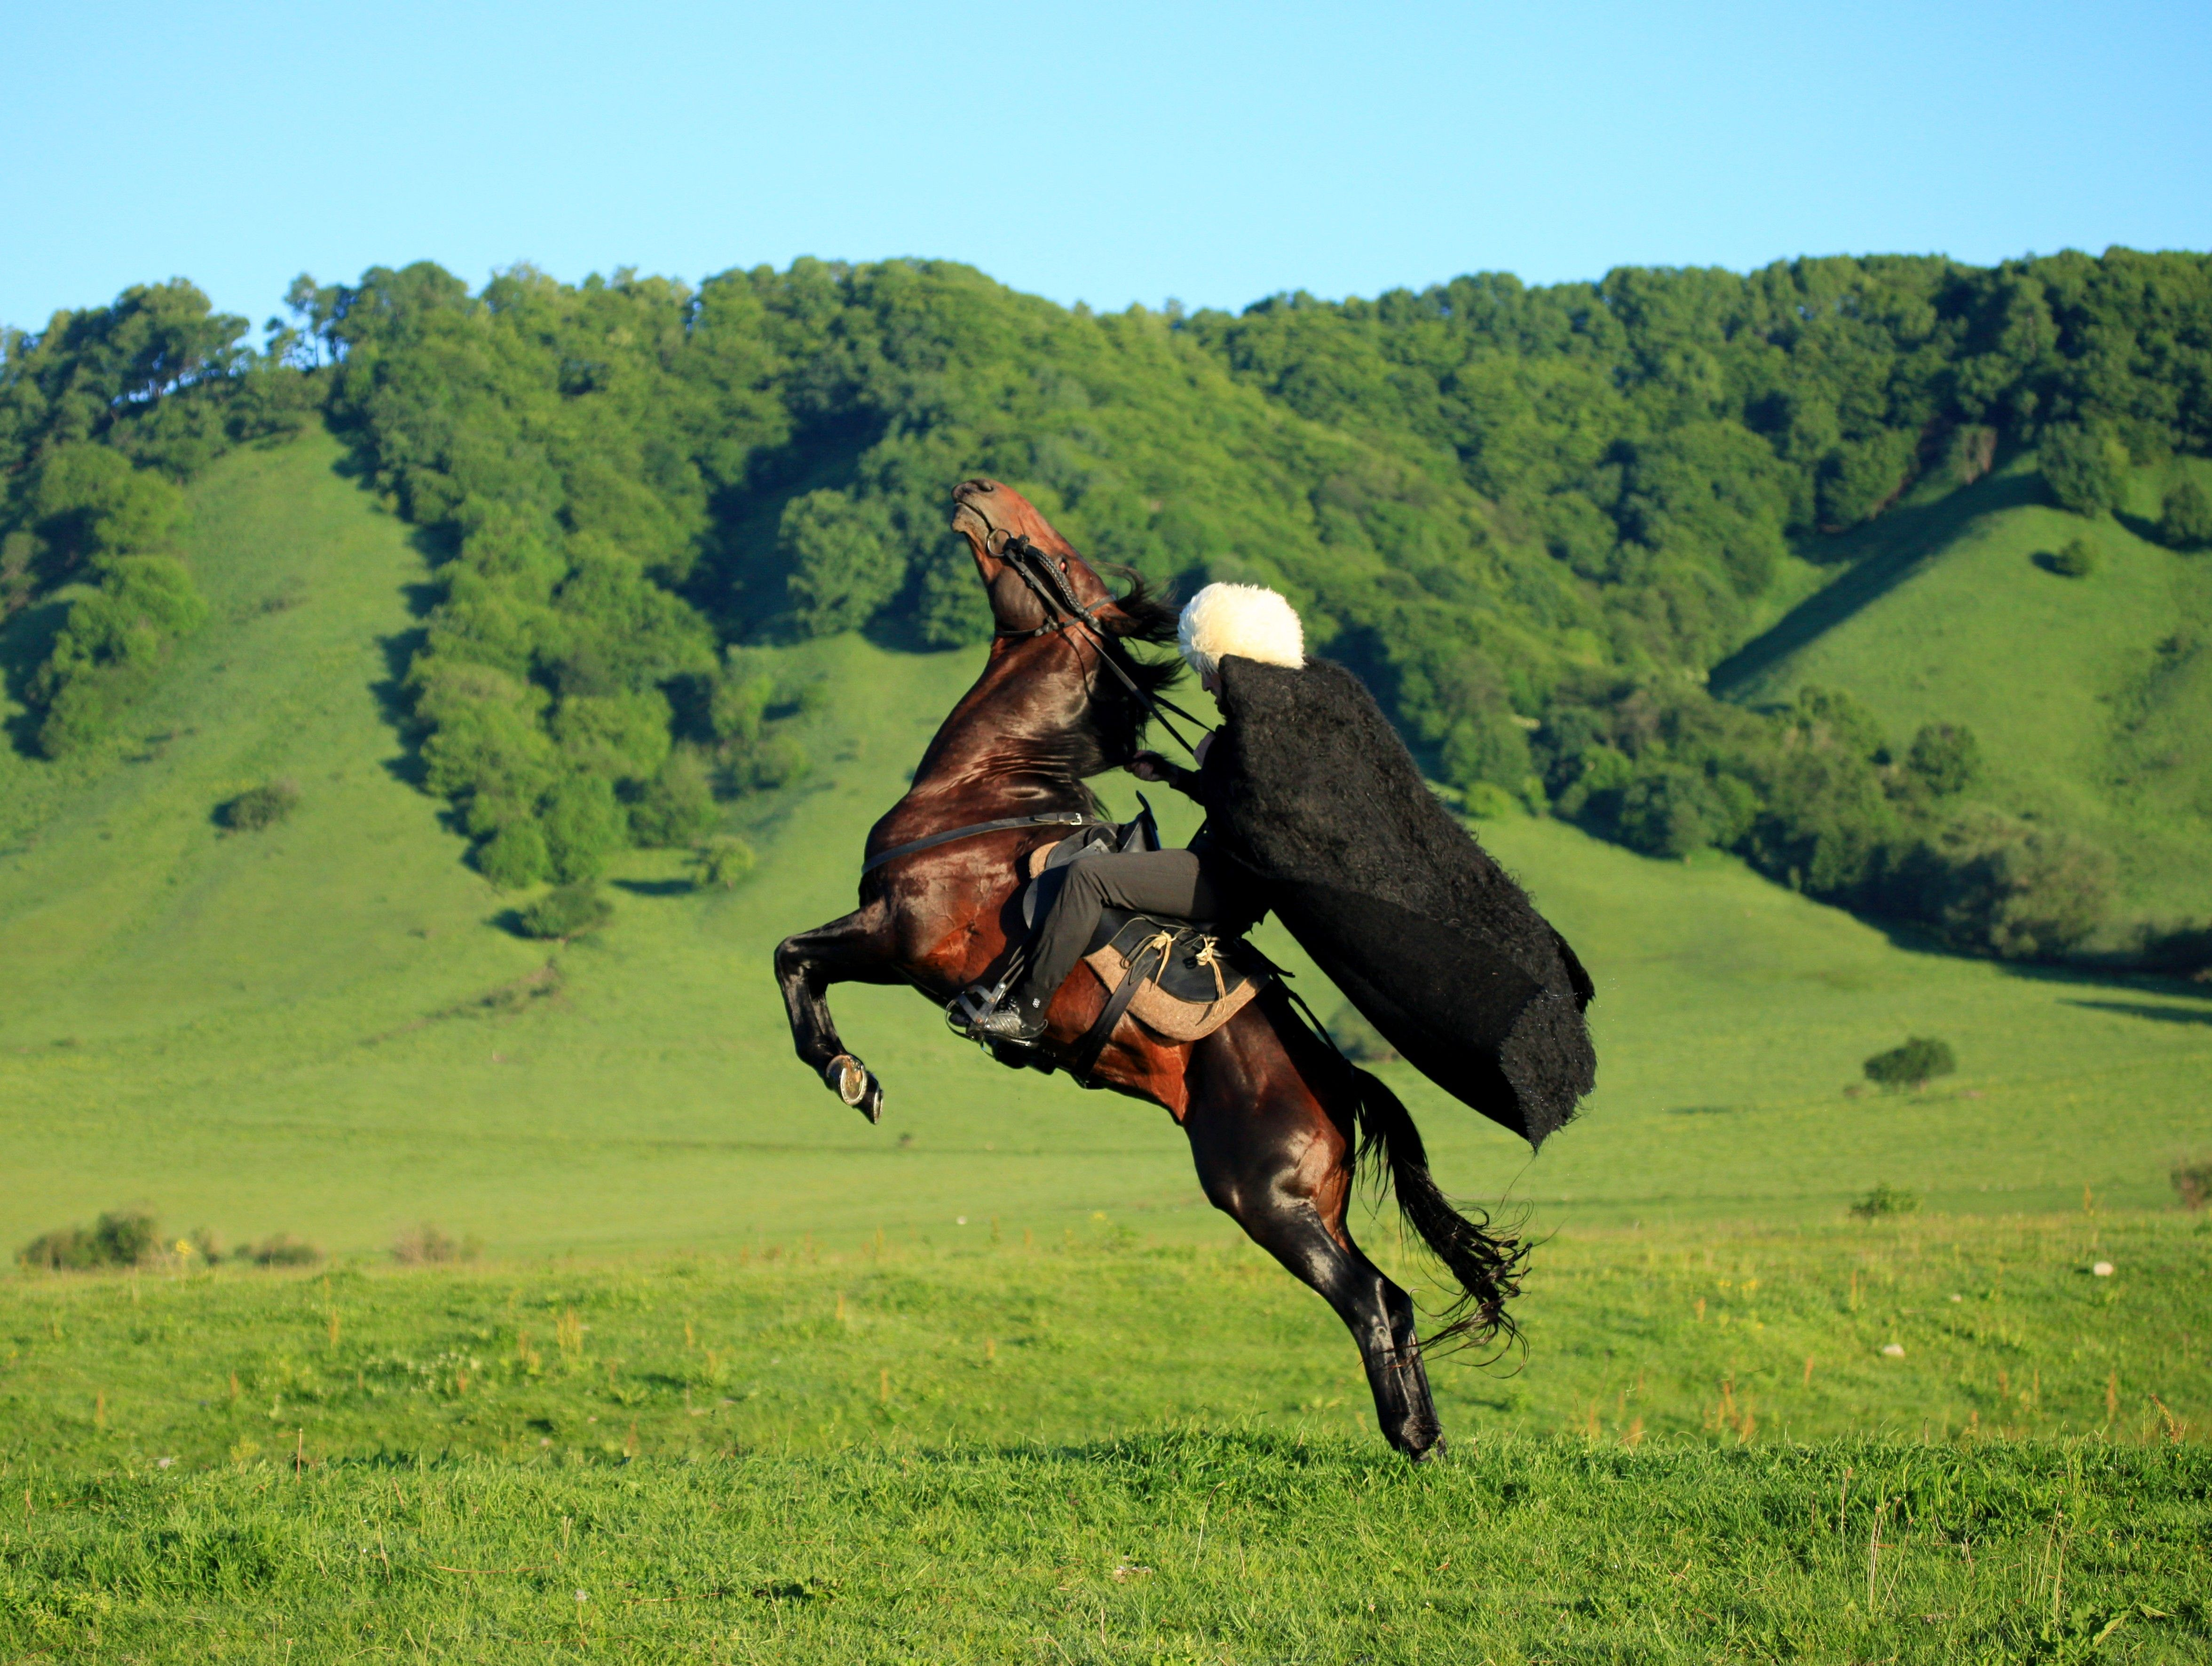 конструкции картинки джигитов на коне моменте кастинга